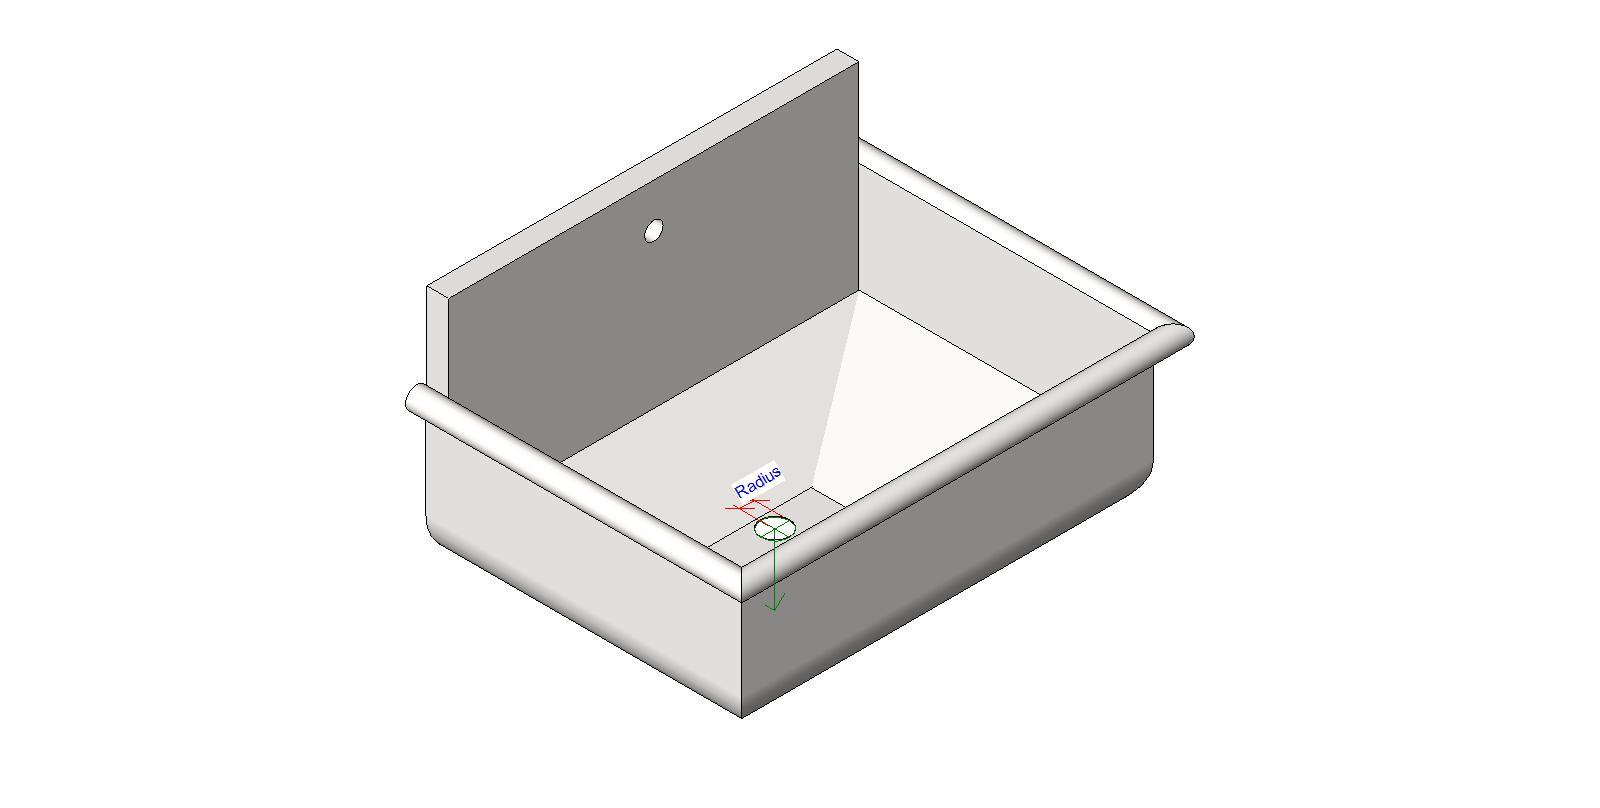 Bathroom Sinks Revit generic residential plumbing fixtures bim objects / families